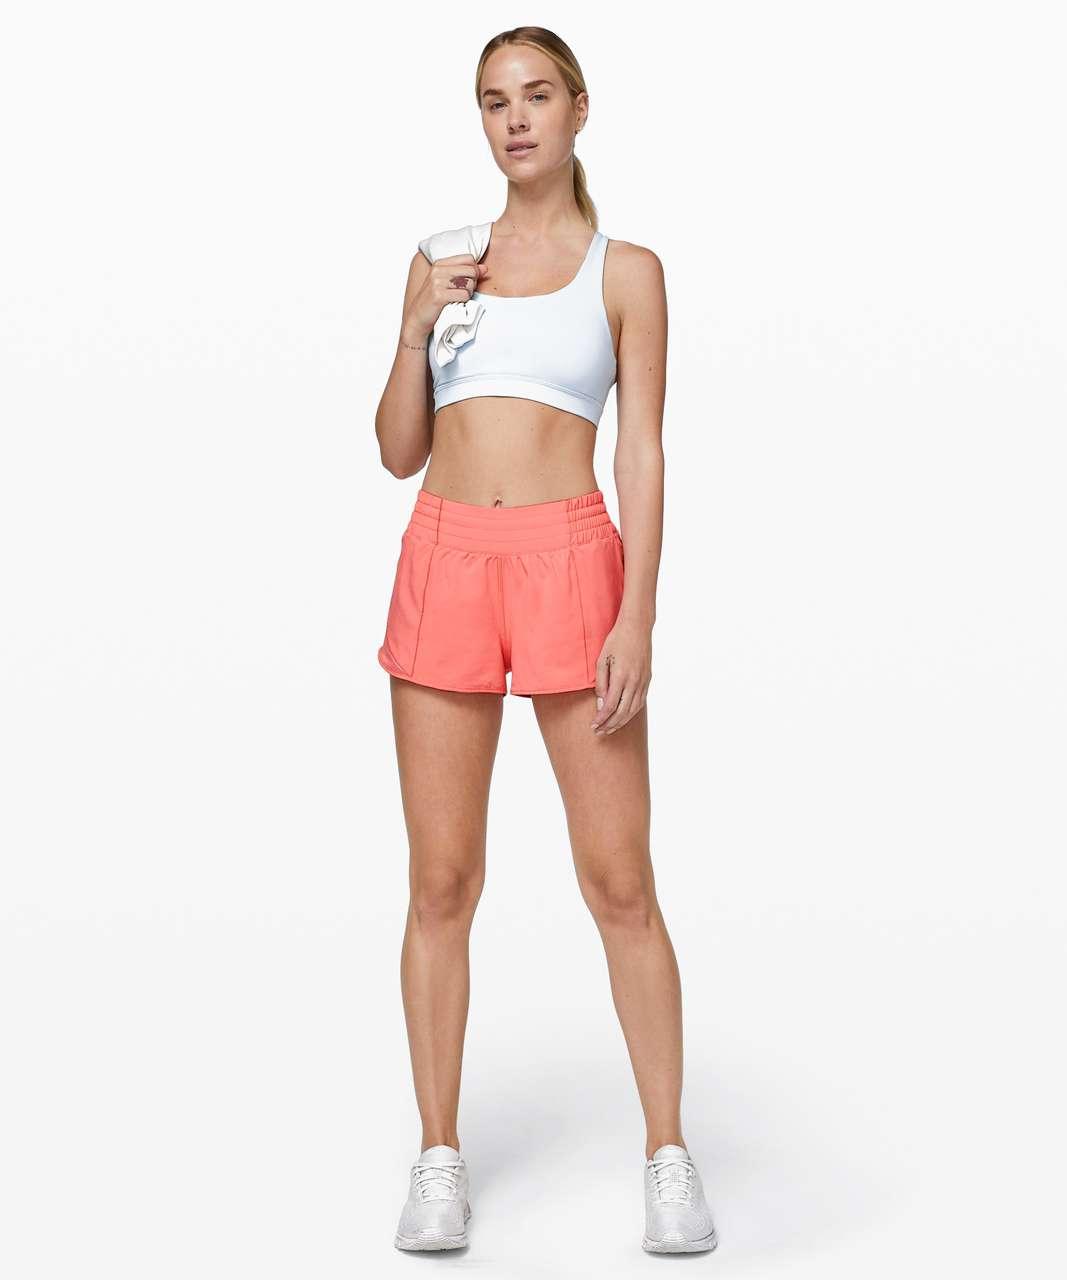 "Lululemon Hotty Hot Short *High-Rise 2.5"" - Light Coral"